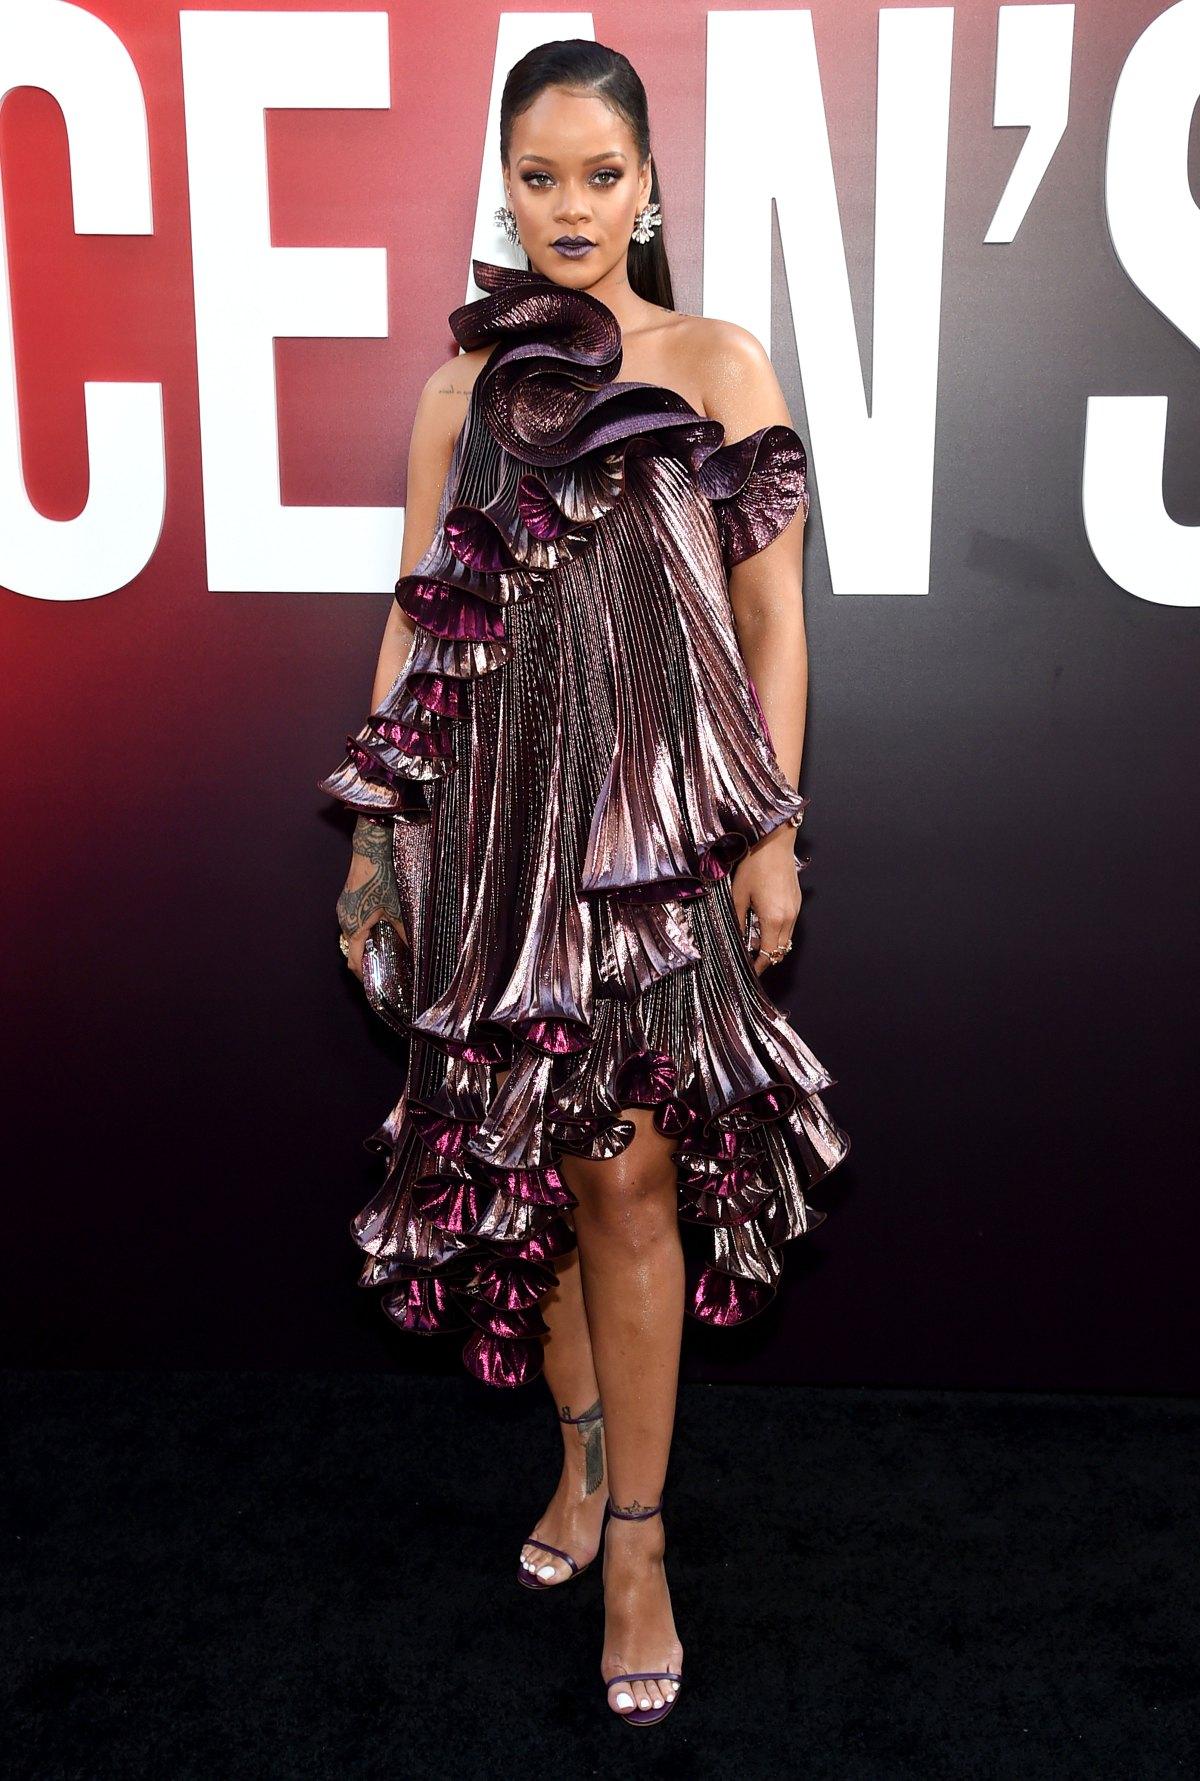 e6273b40f4e05 Ocean s 8 Red Carpet Fashion  Rihanna